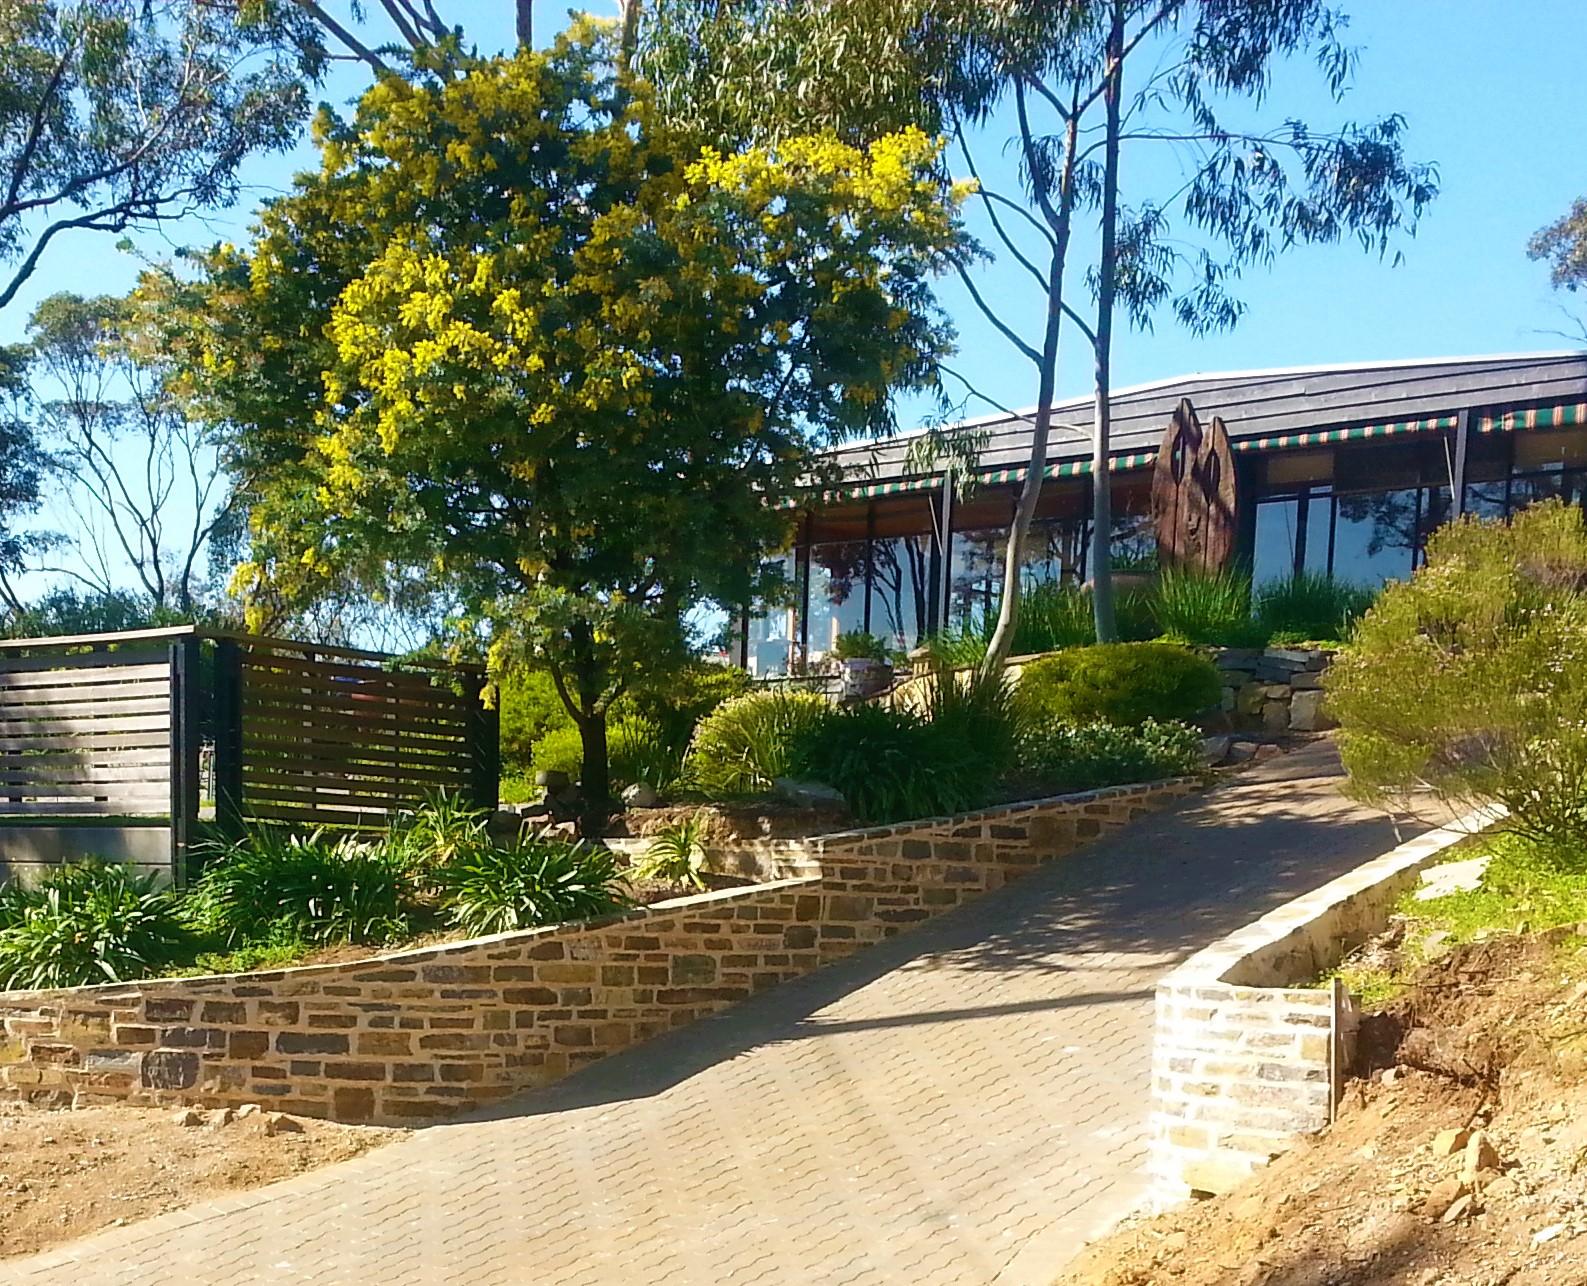 Entry retaining walls. Blackwood, Adelaide, South Australia